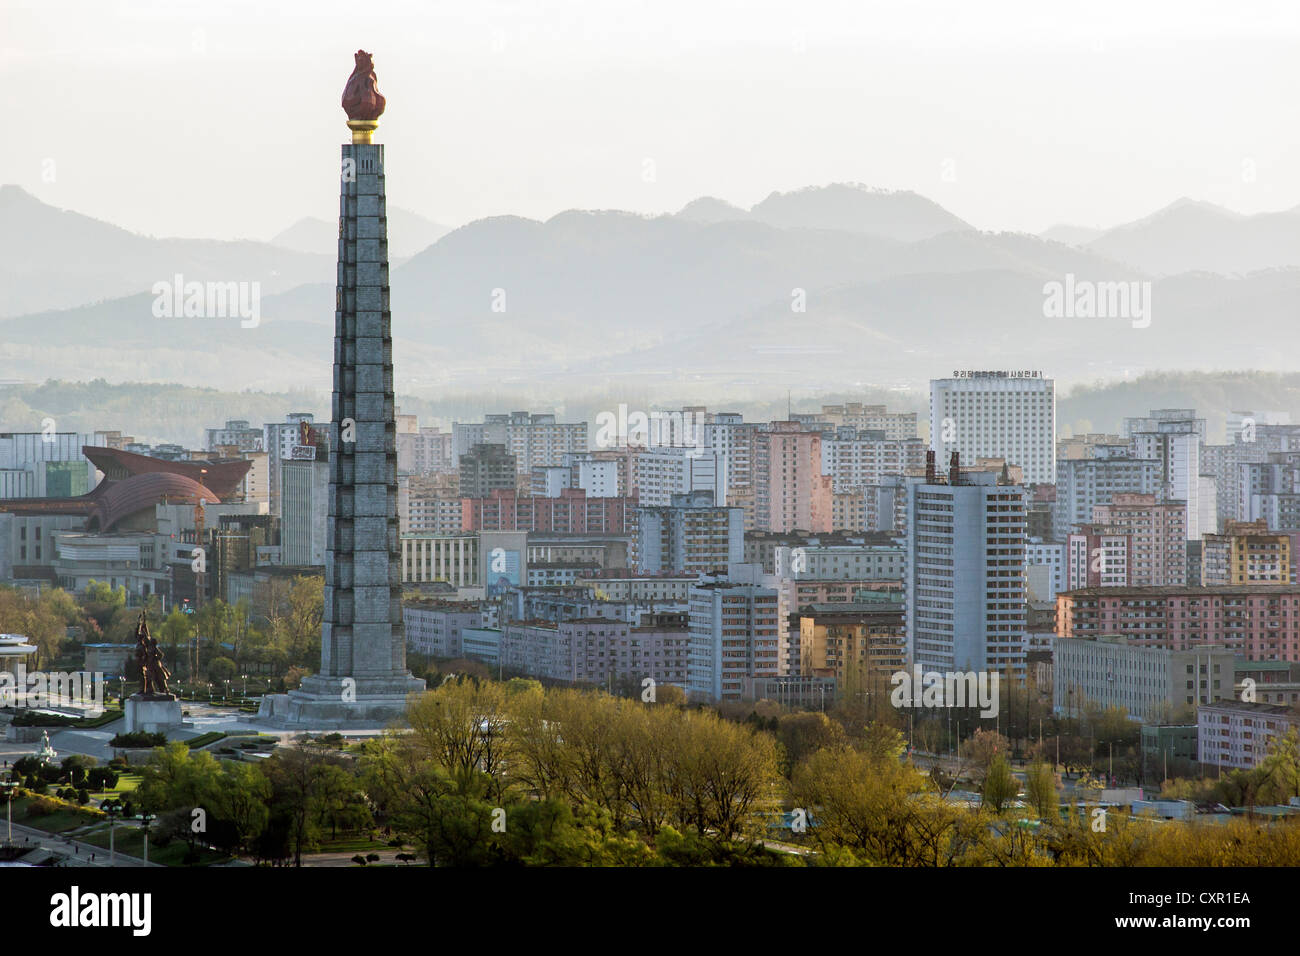 Democratic Peoples's Republic of Korea (DPRK), North Korea, Pyongyang, city skyline and the Juche Tower - Stock Image